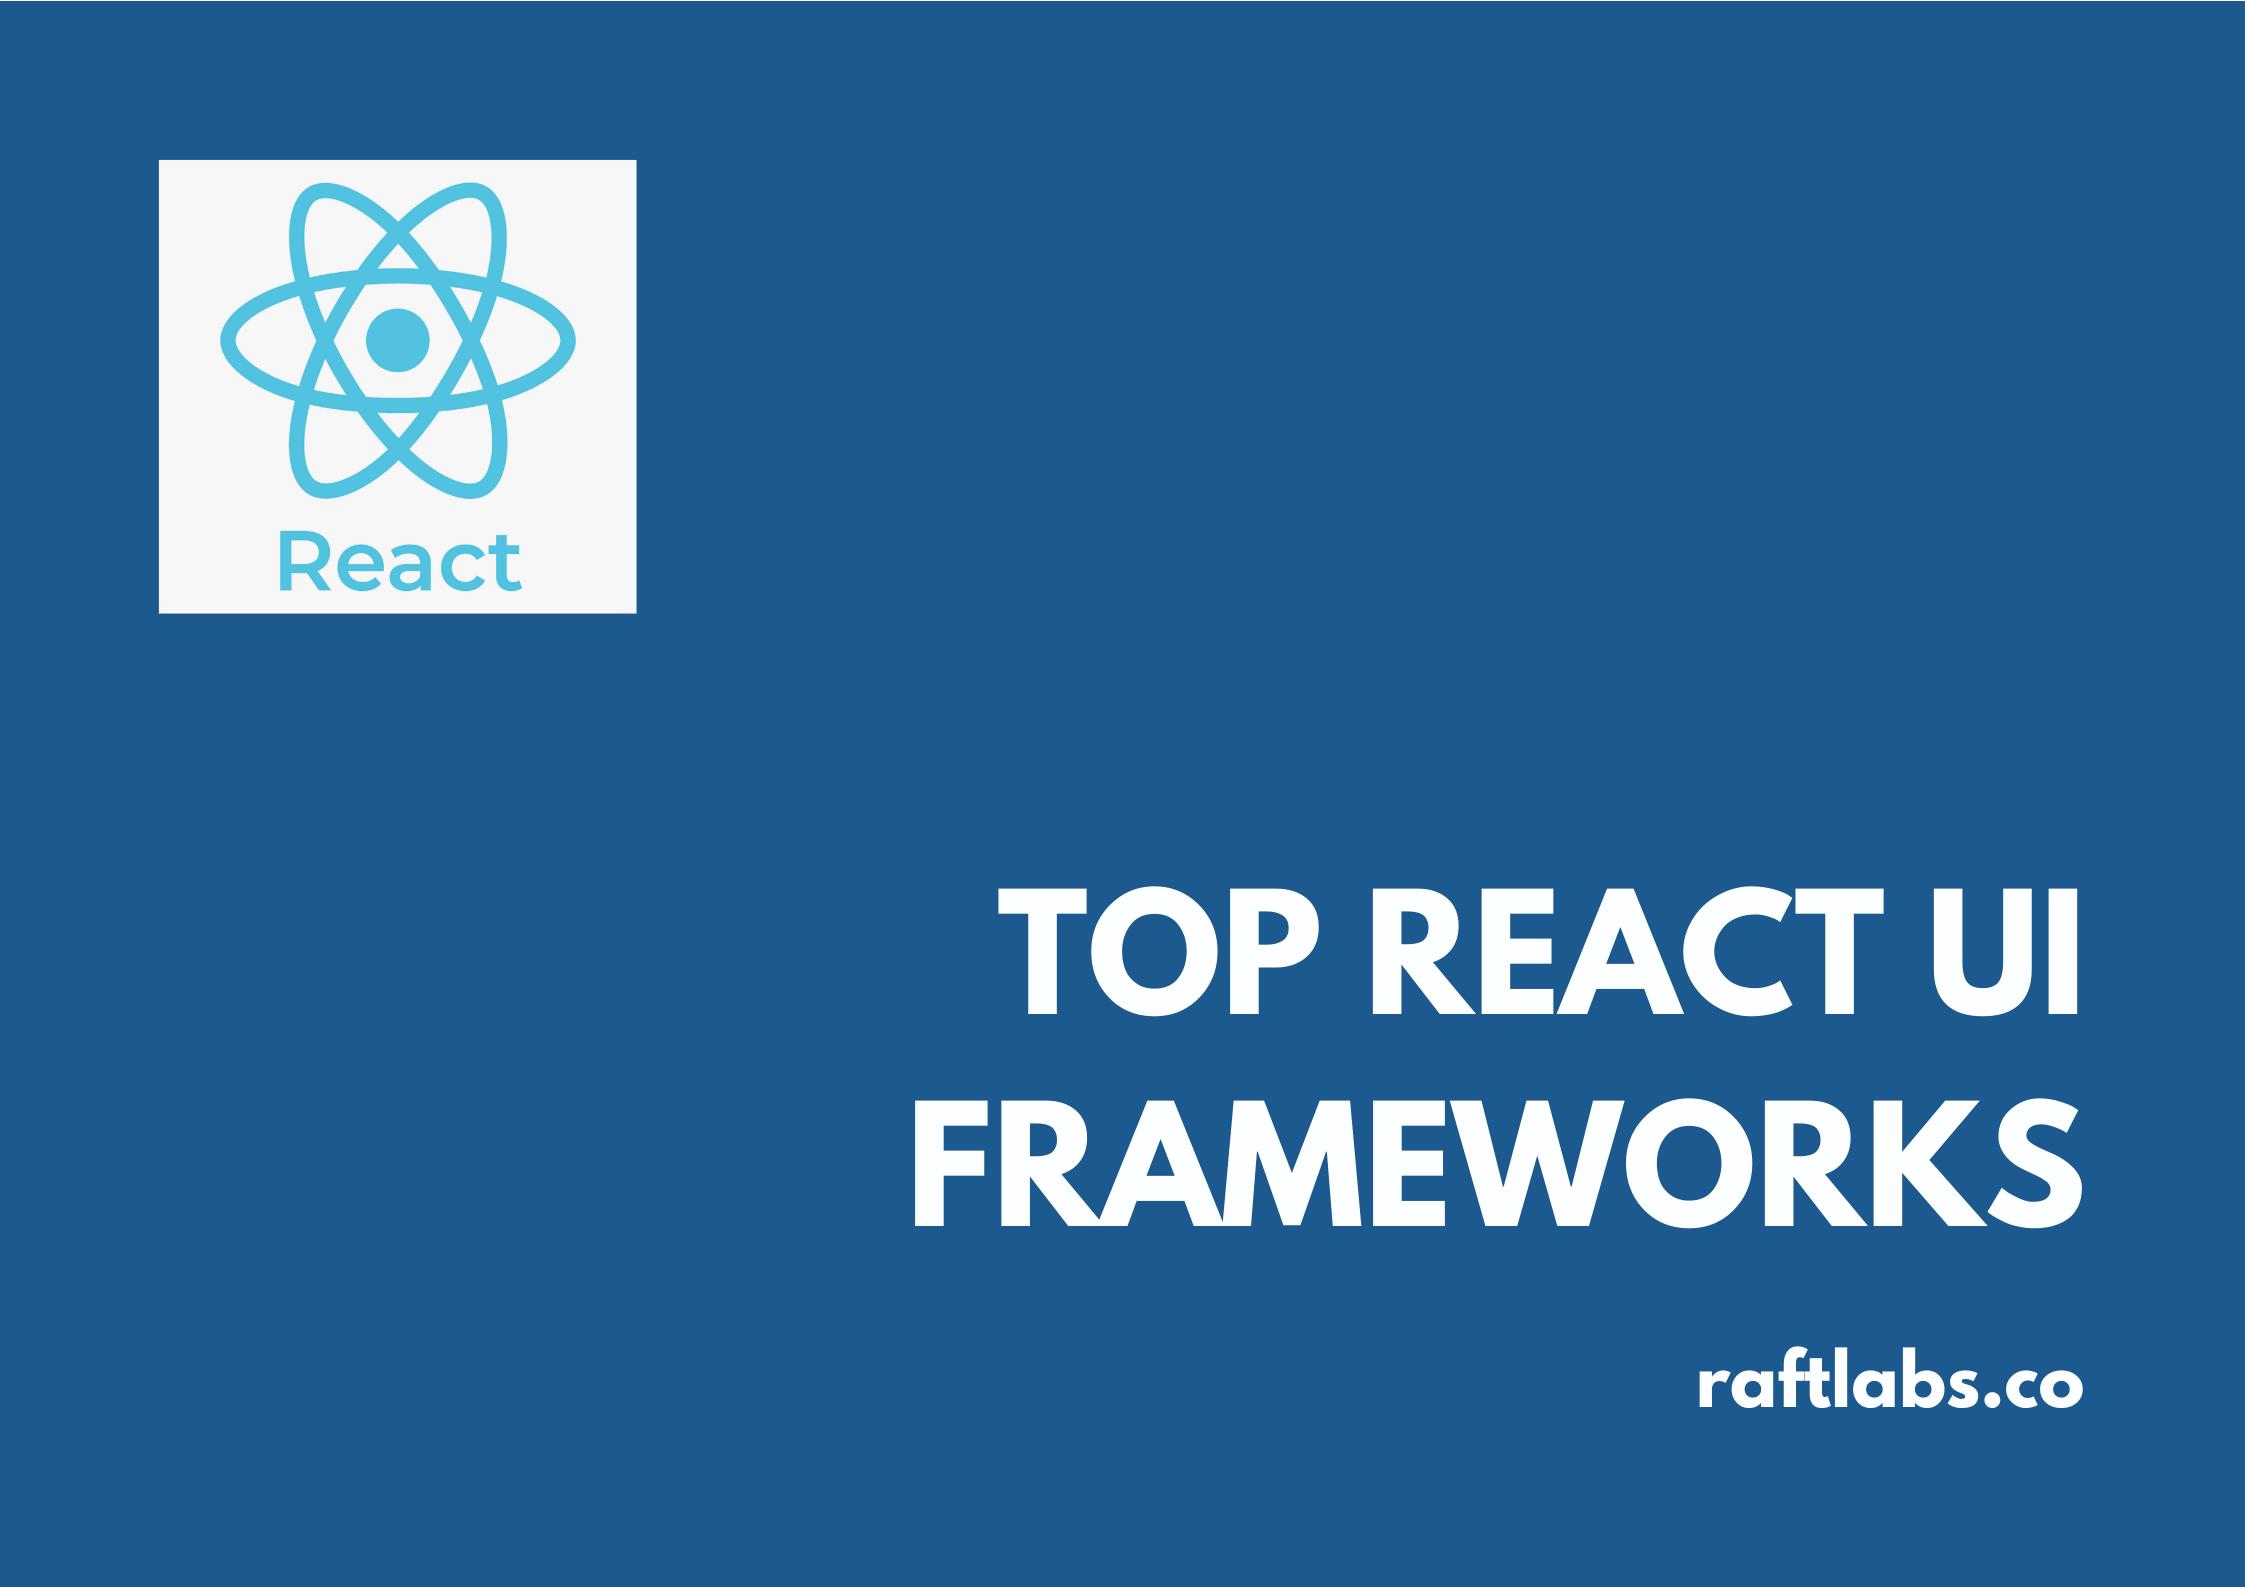 Top 10 React UI Frameworks with React logo - raftlabs.co